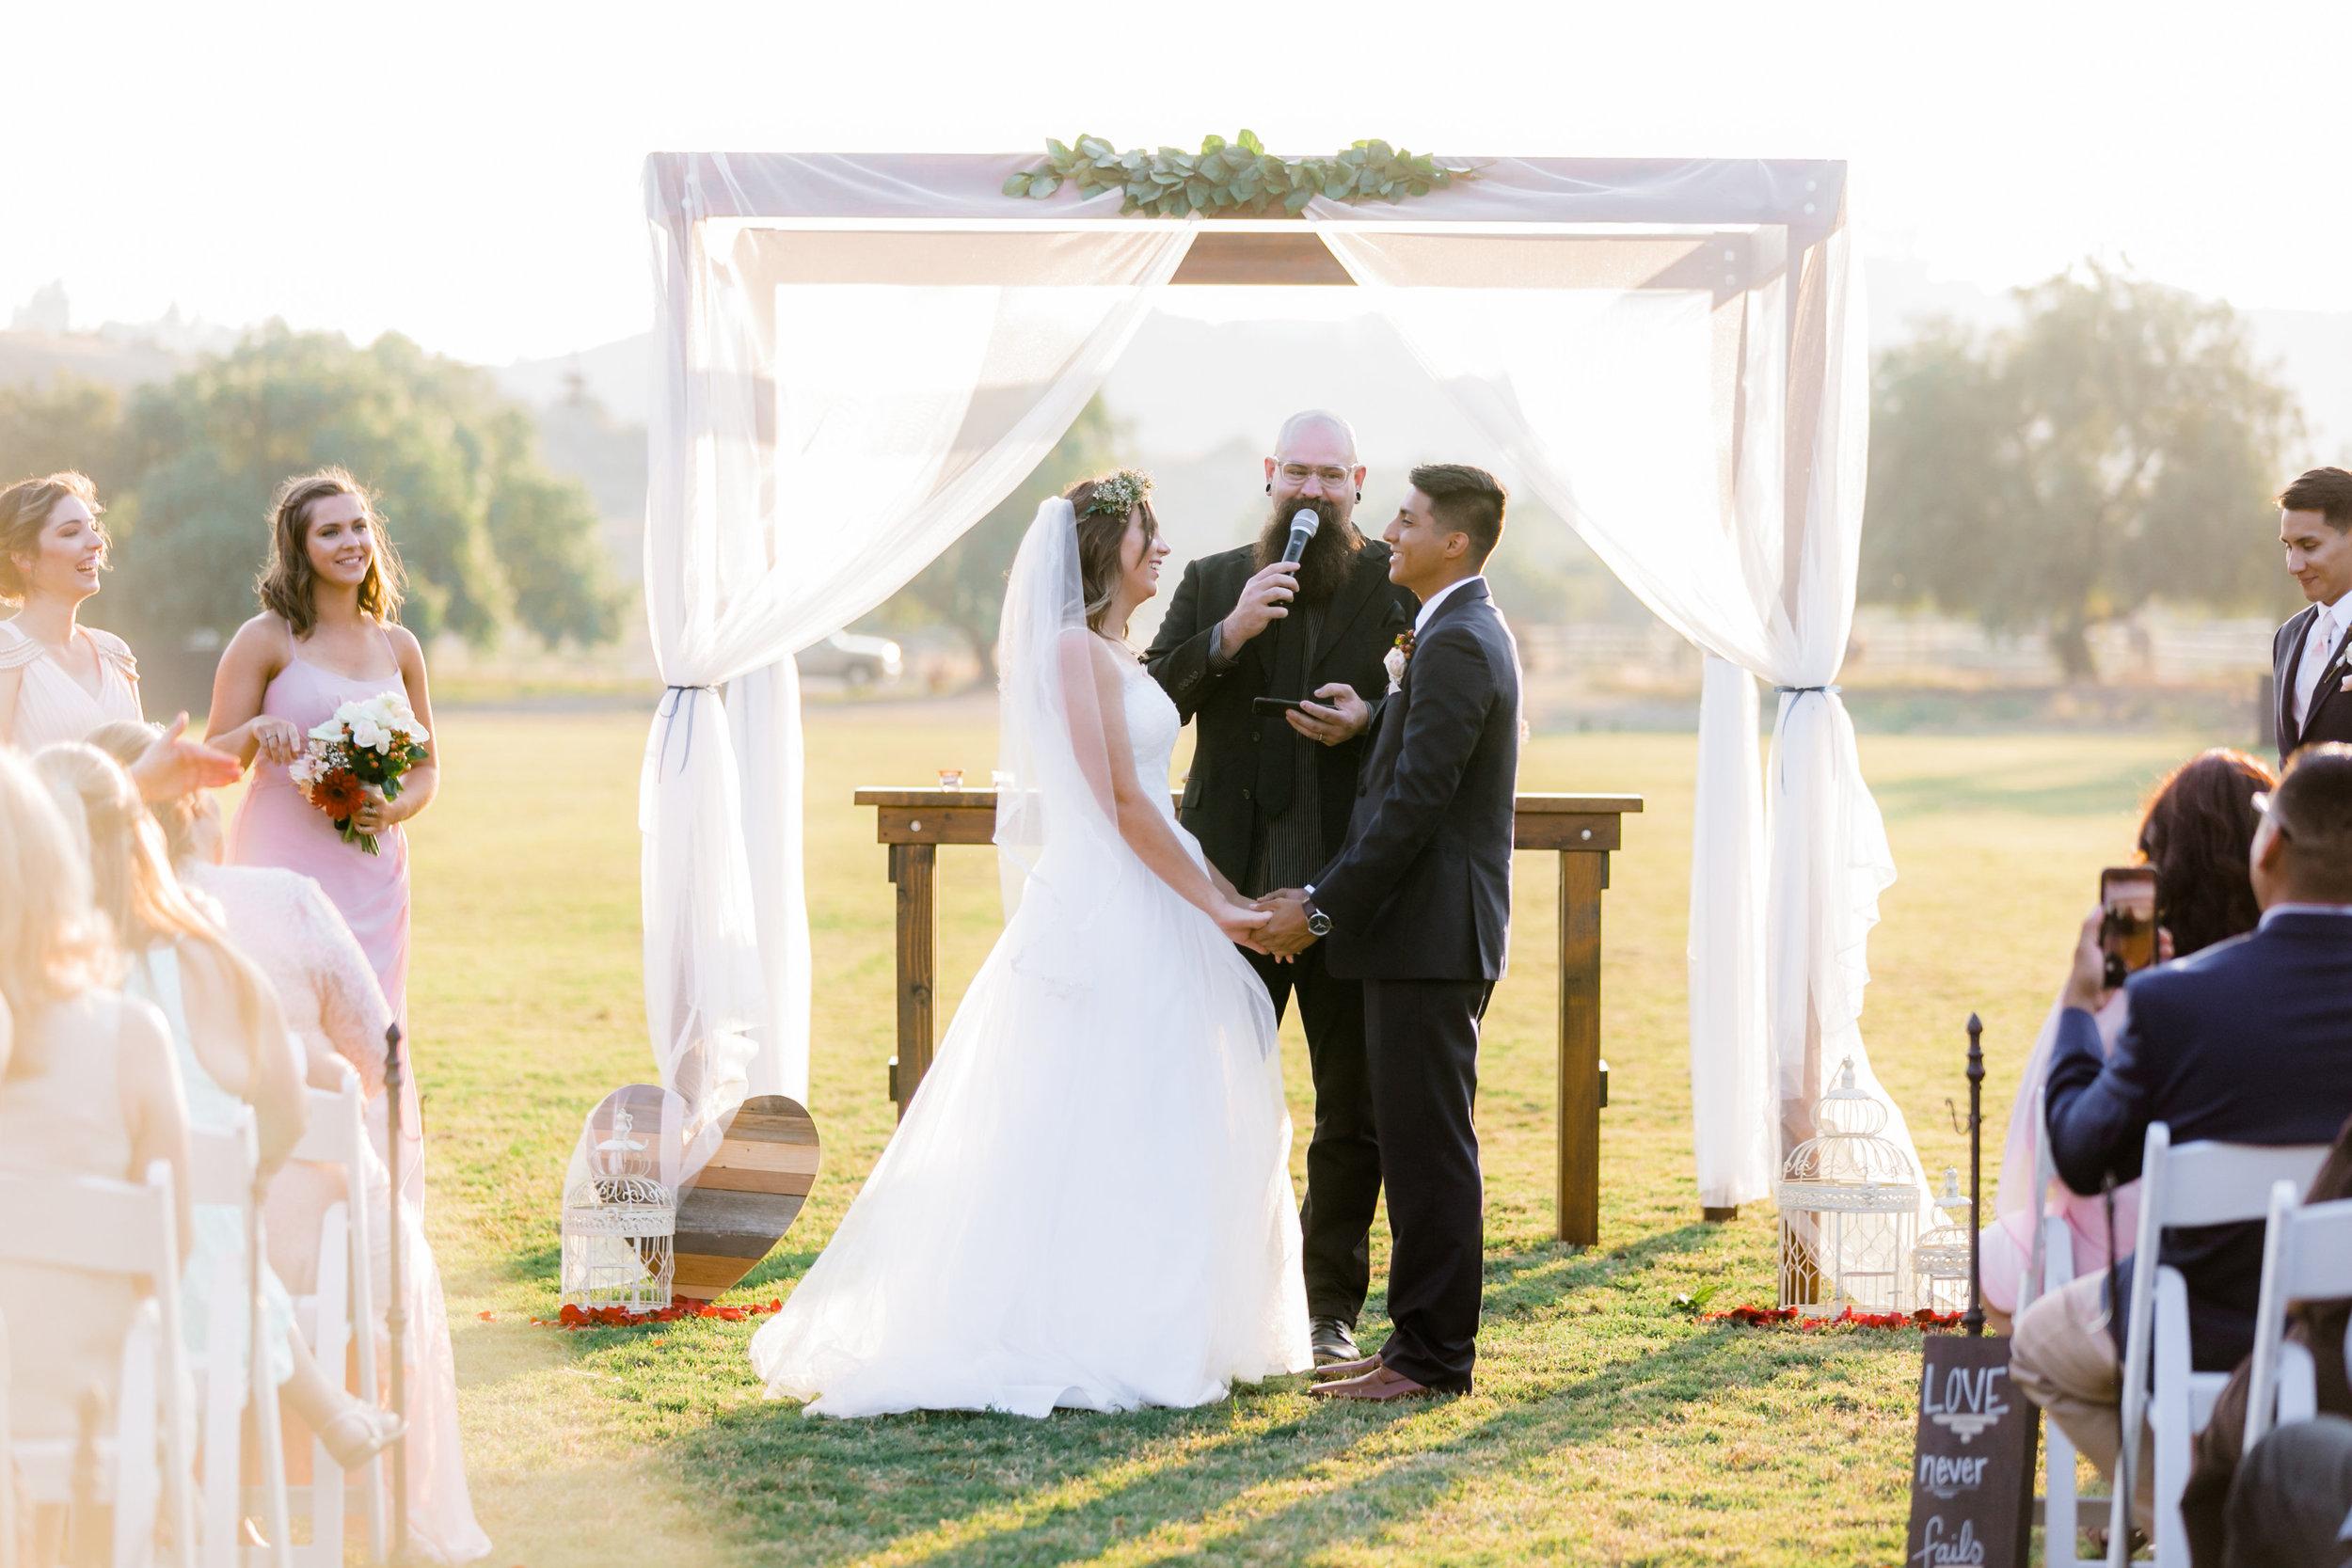 Sylis Brenae Married-Ceremony-0116.jpg